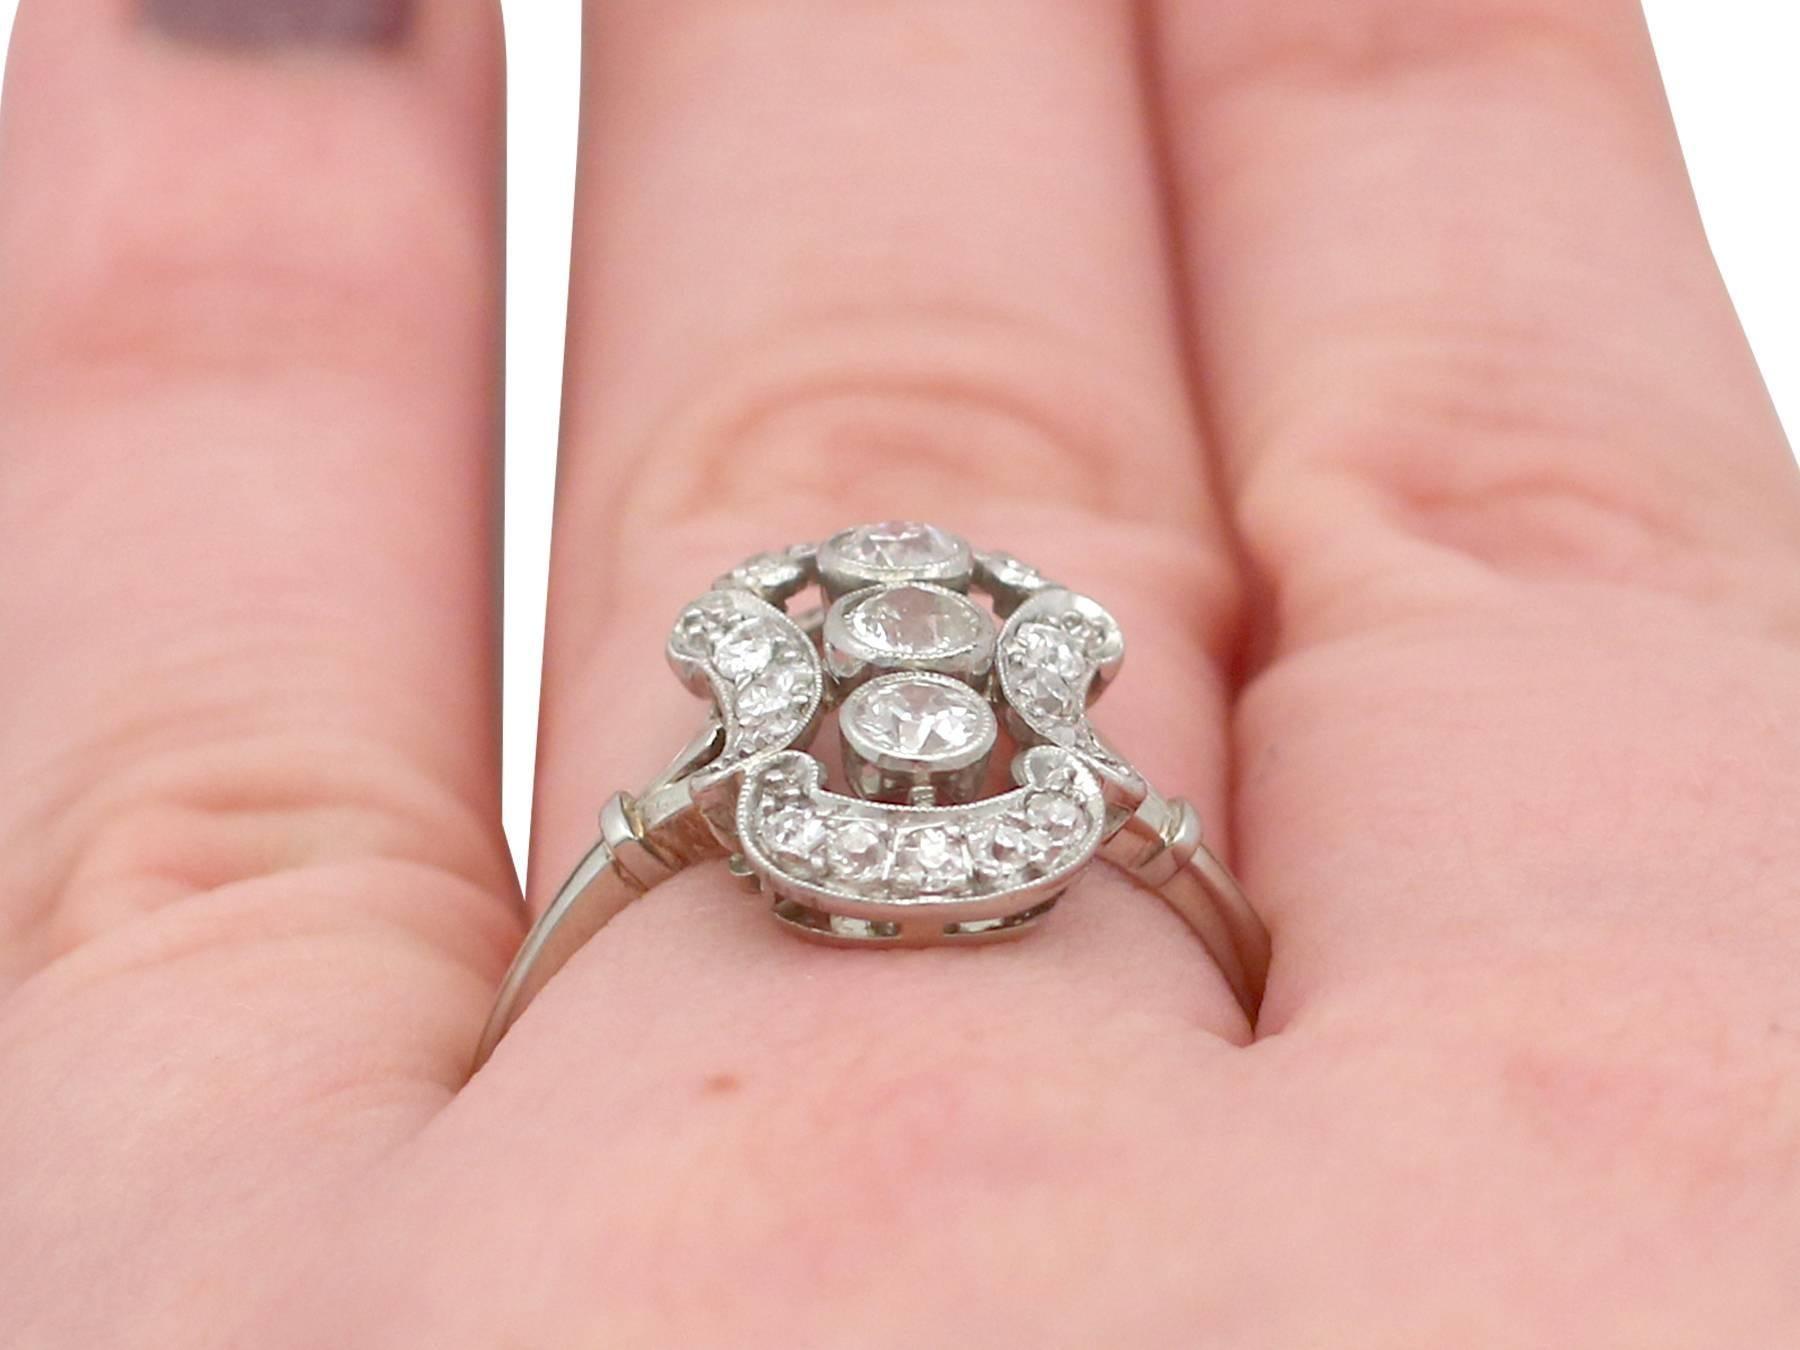 1920s Diamond 14 Karat White Gold Dress Ring For Sale at 1stdibs